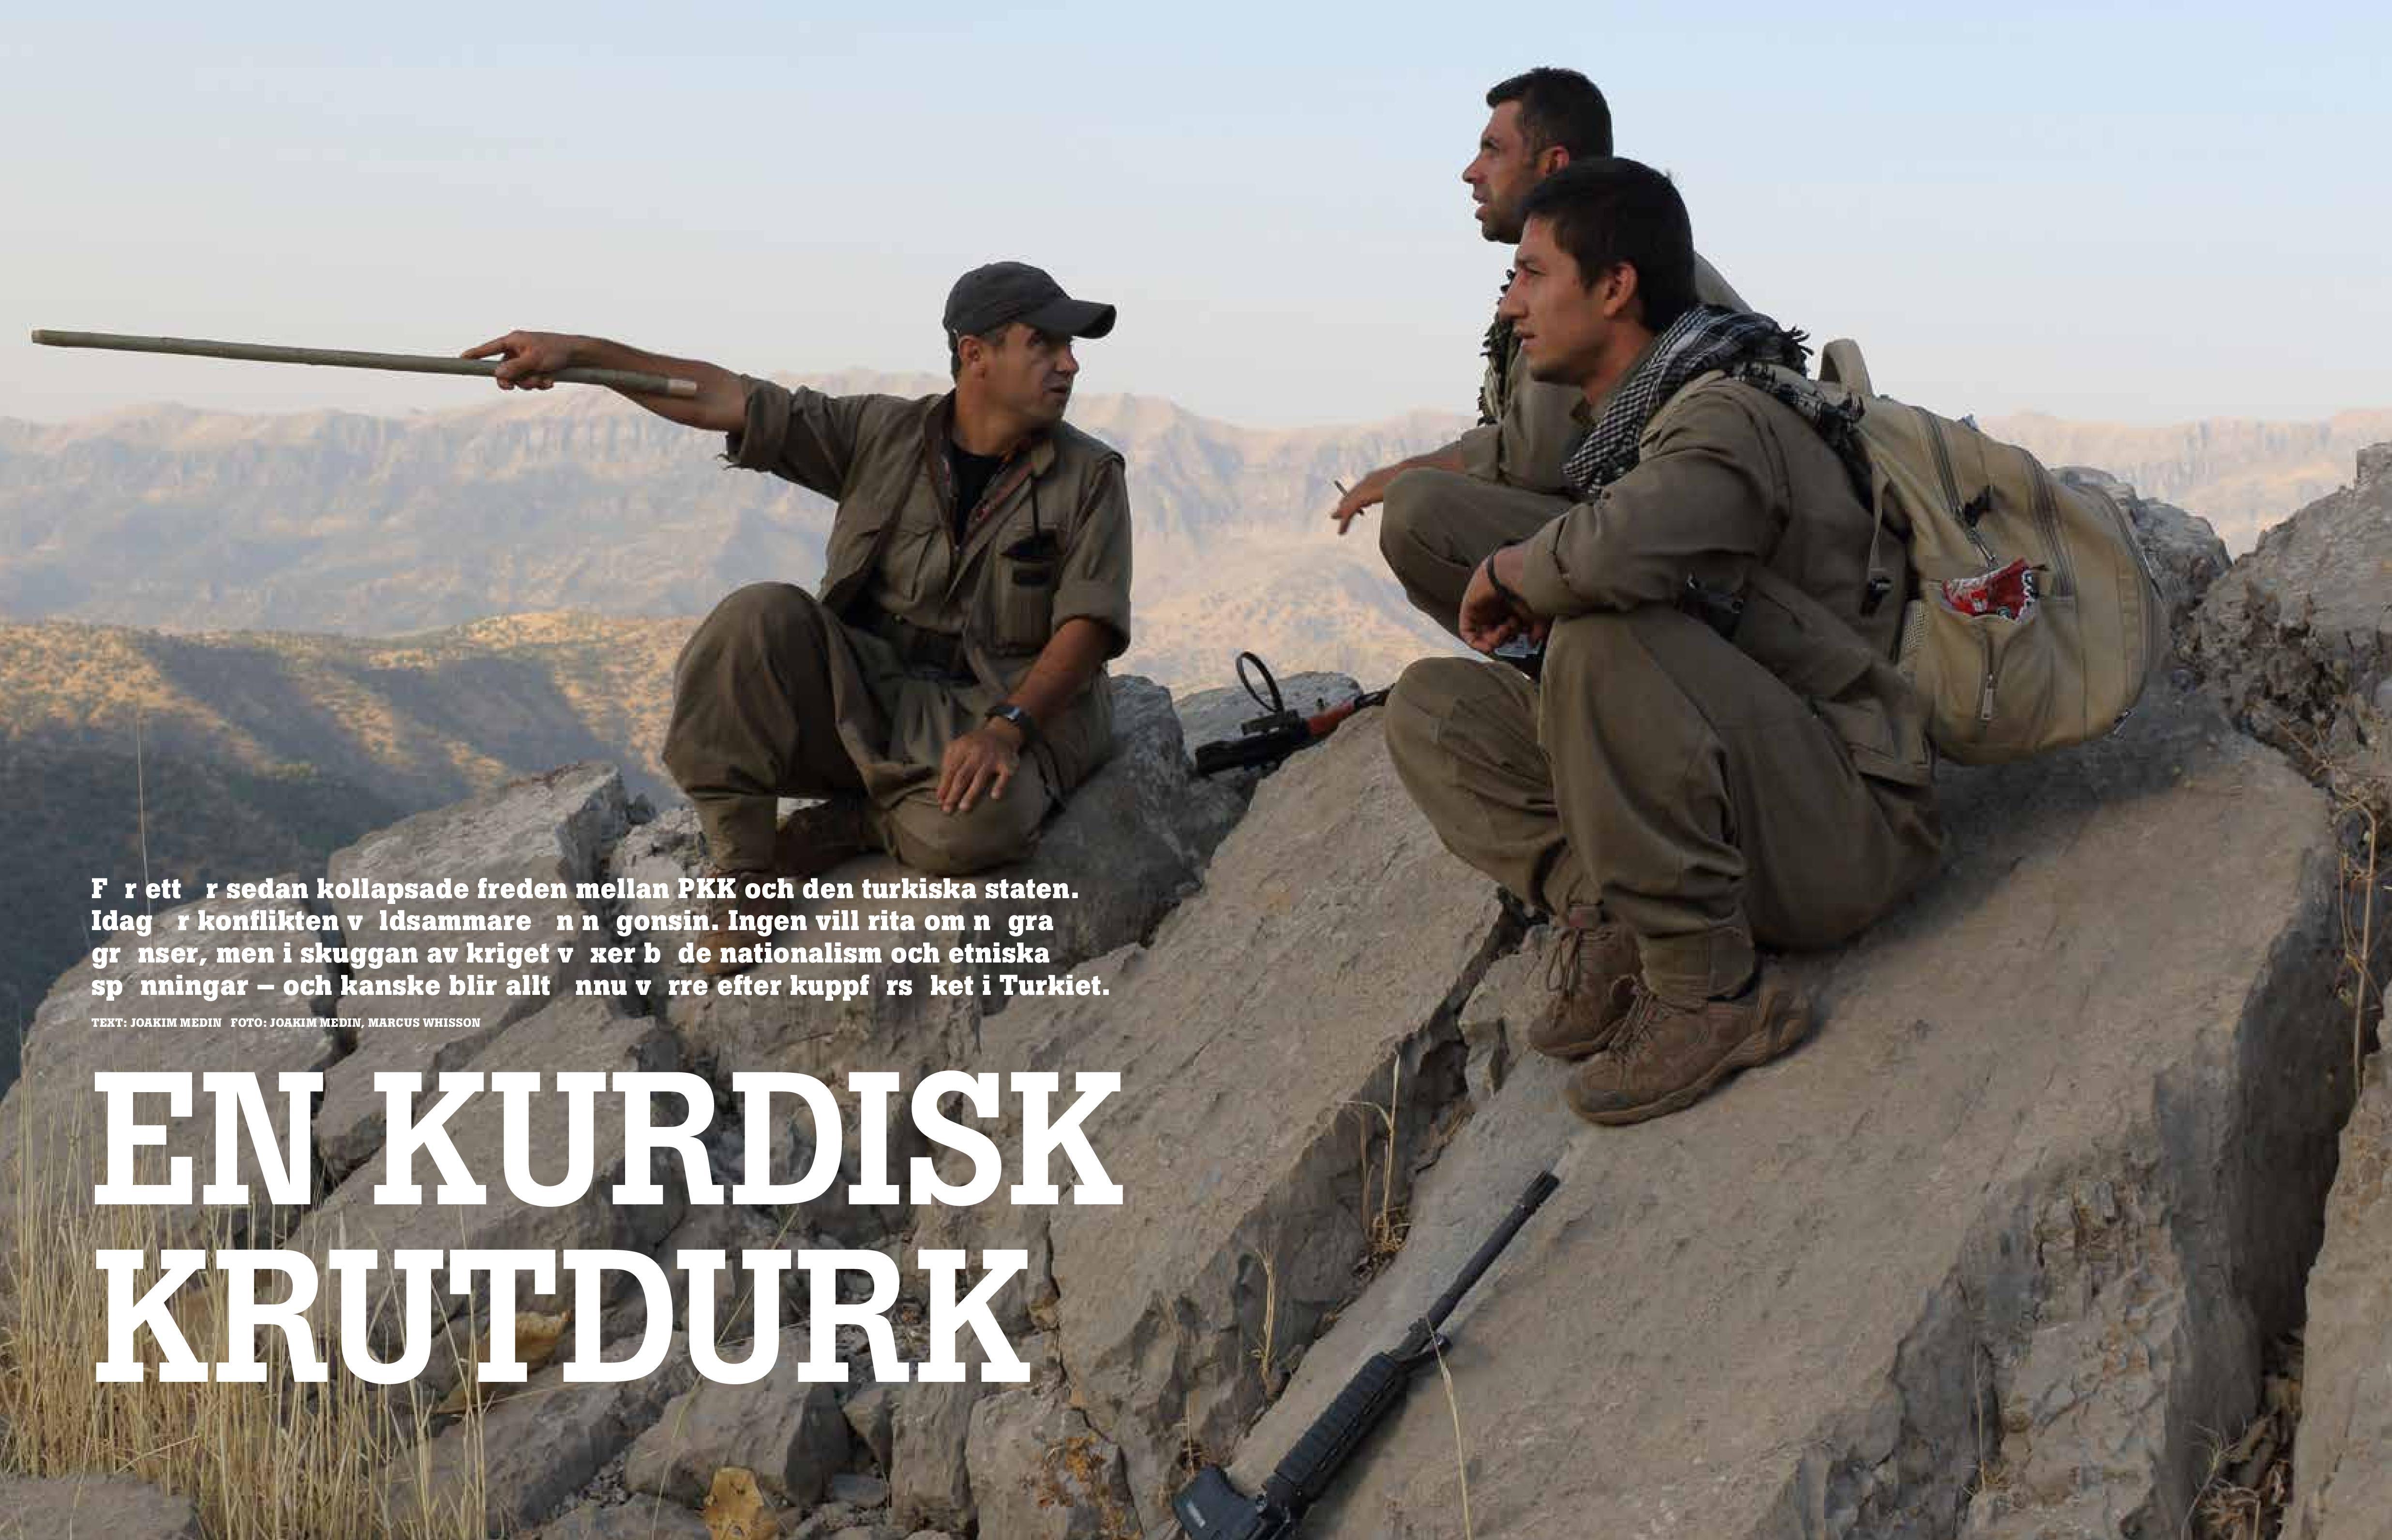 Kurdisk krutdurk, Frihet sep 2016